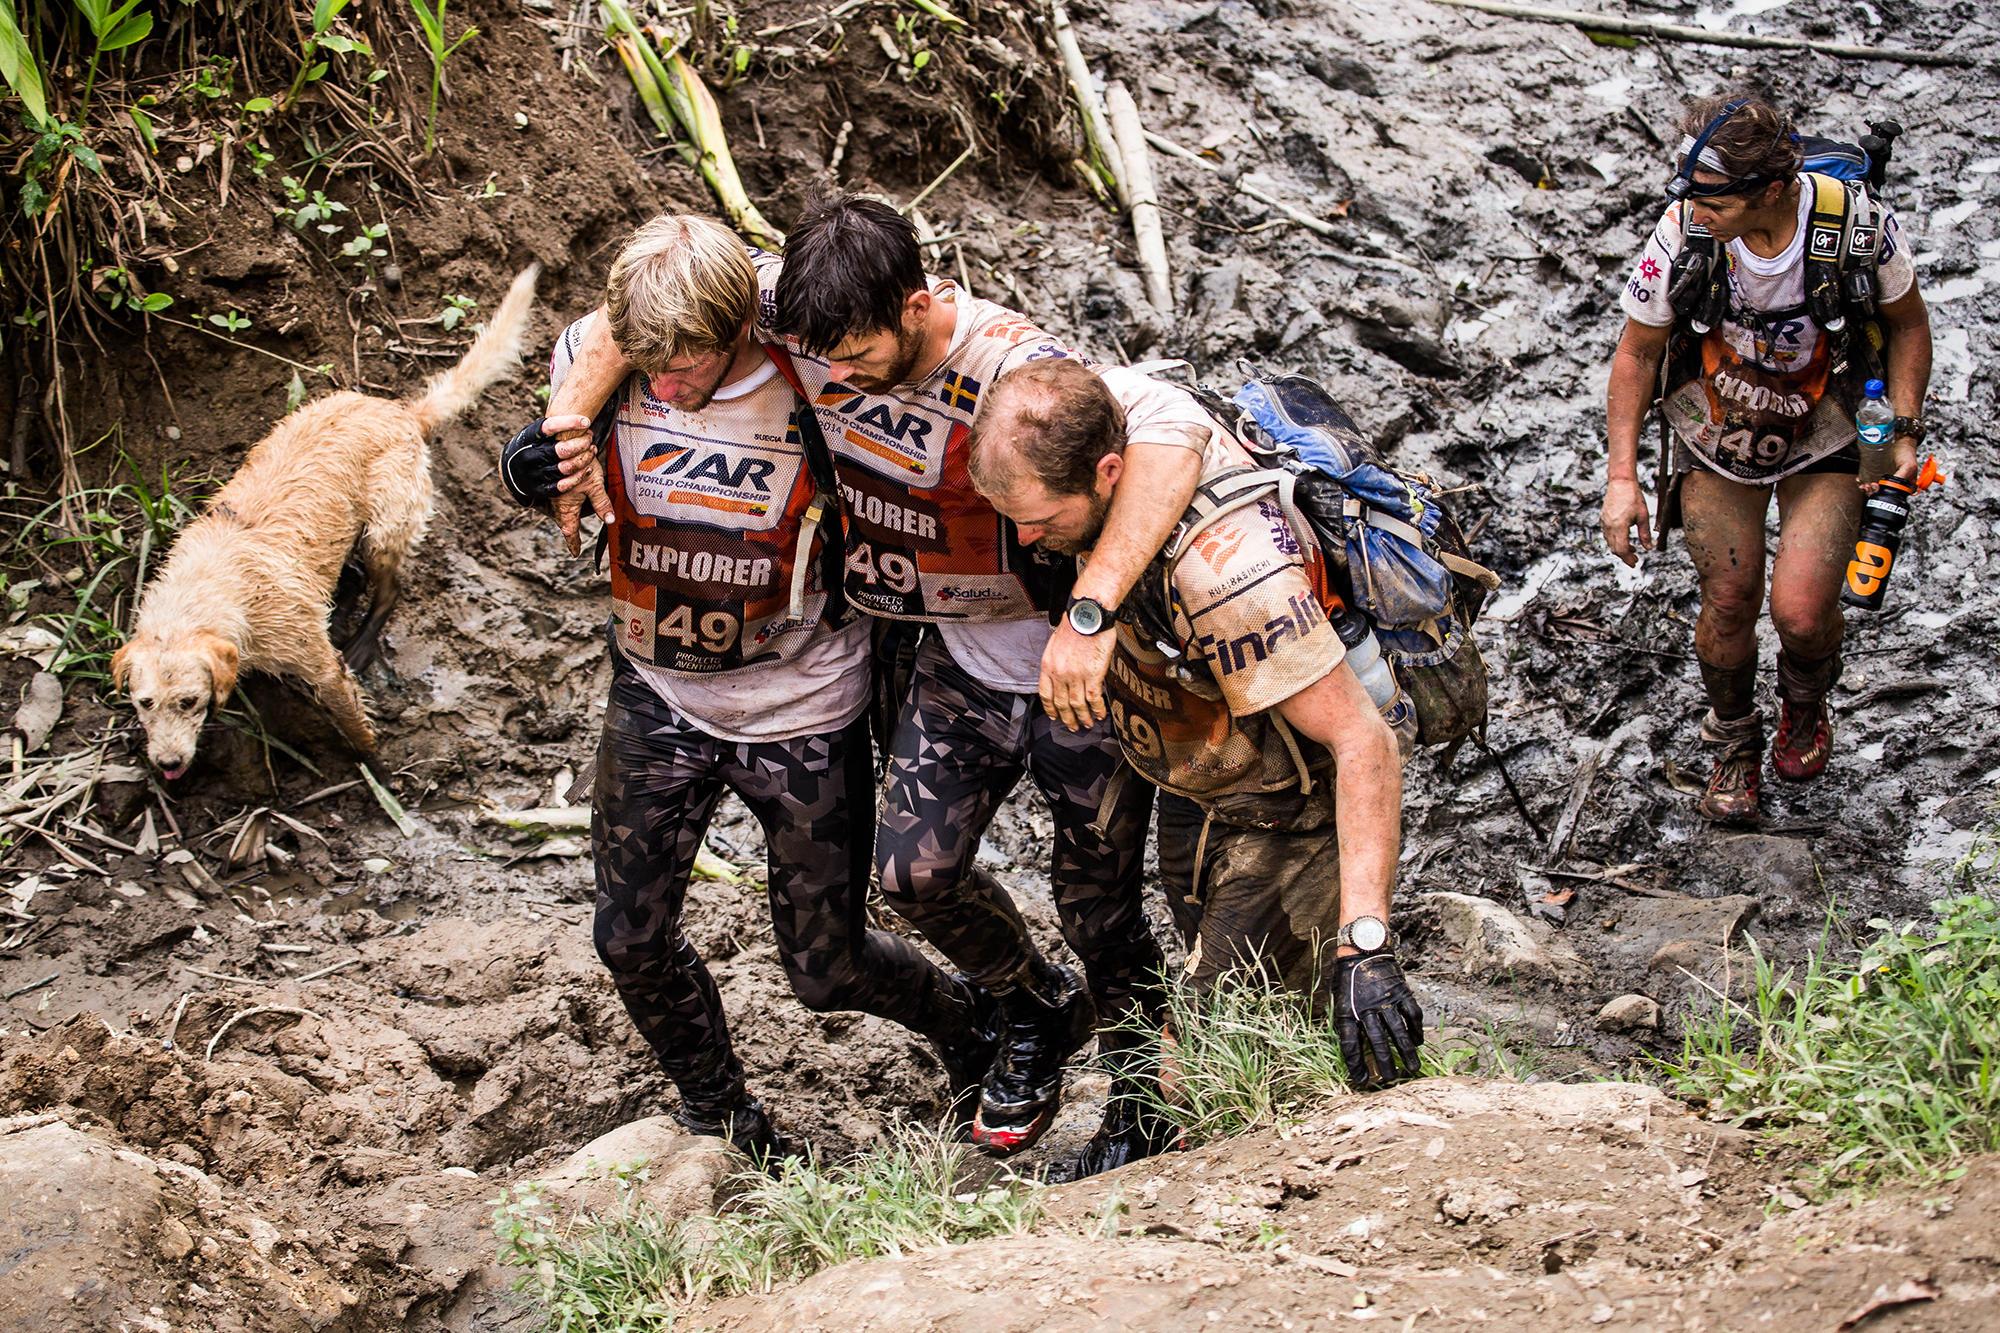 stray-dog-follows-endurance-racers-01